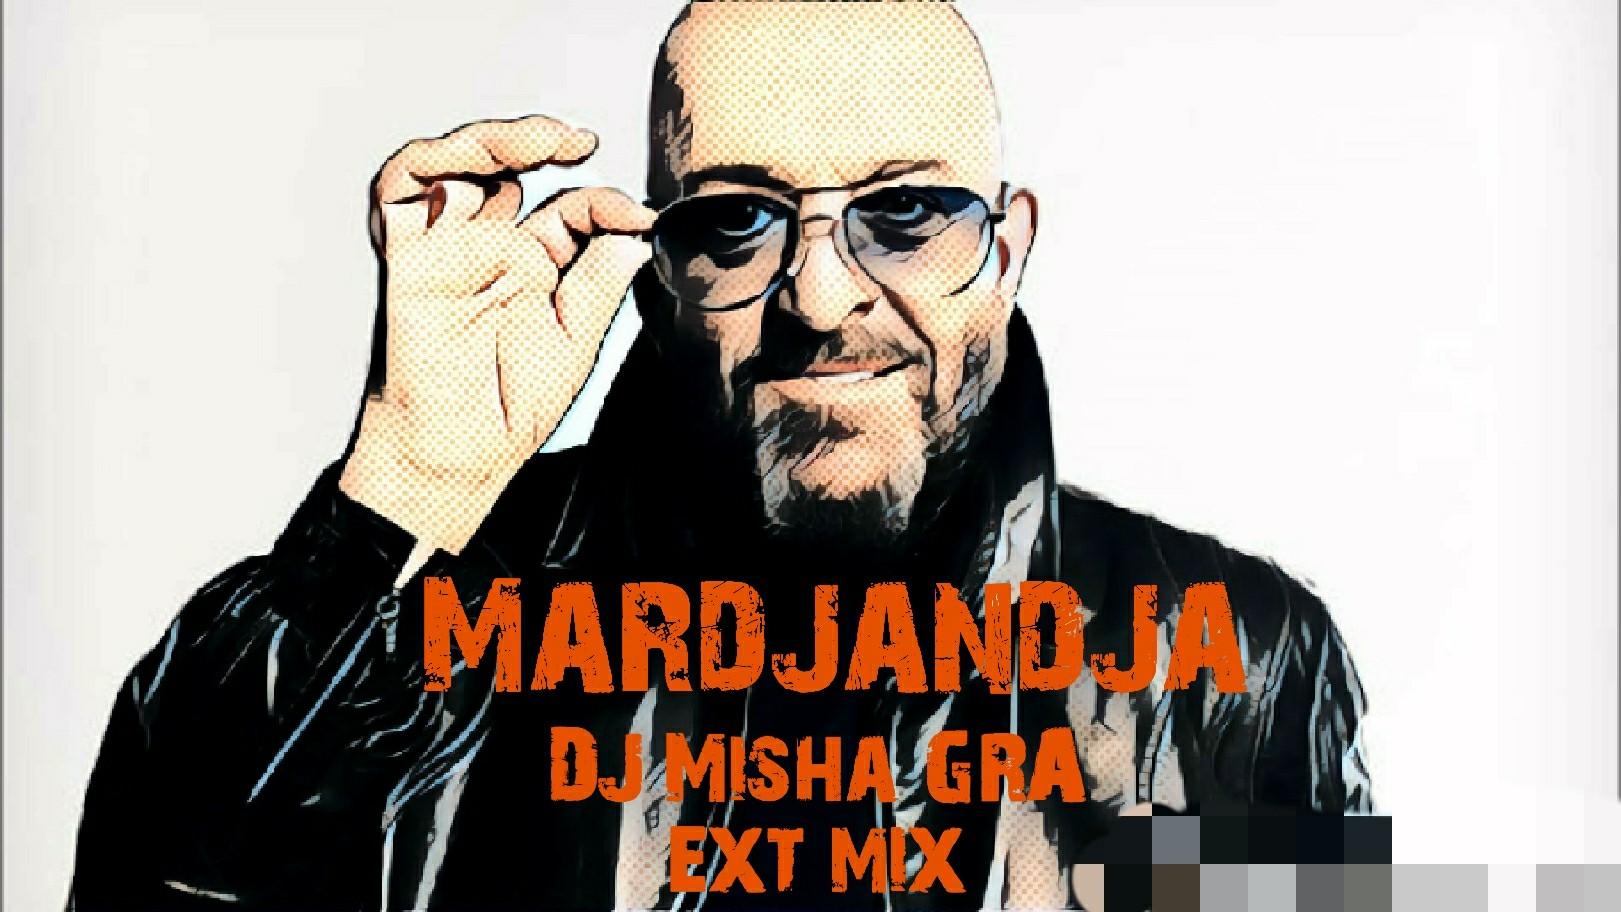 Михаил Шуфутинский - Марджанджа  (DJ Misha GRA ext mix)